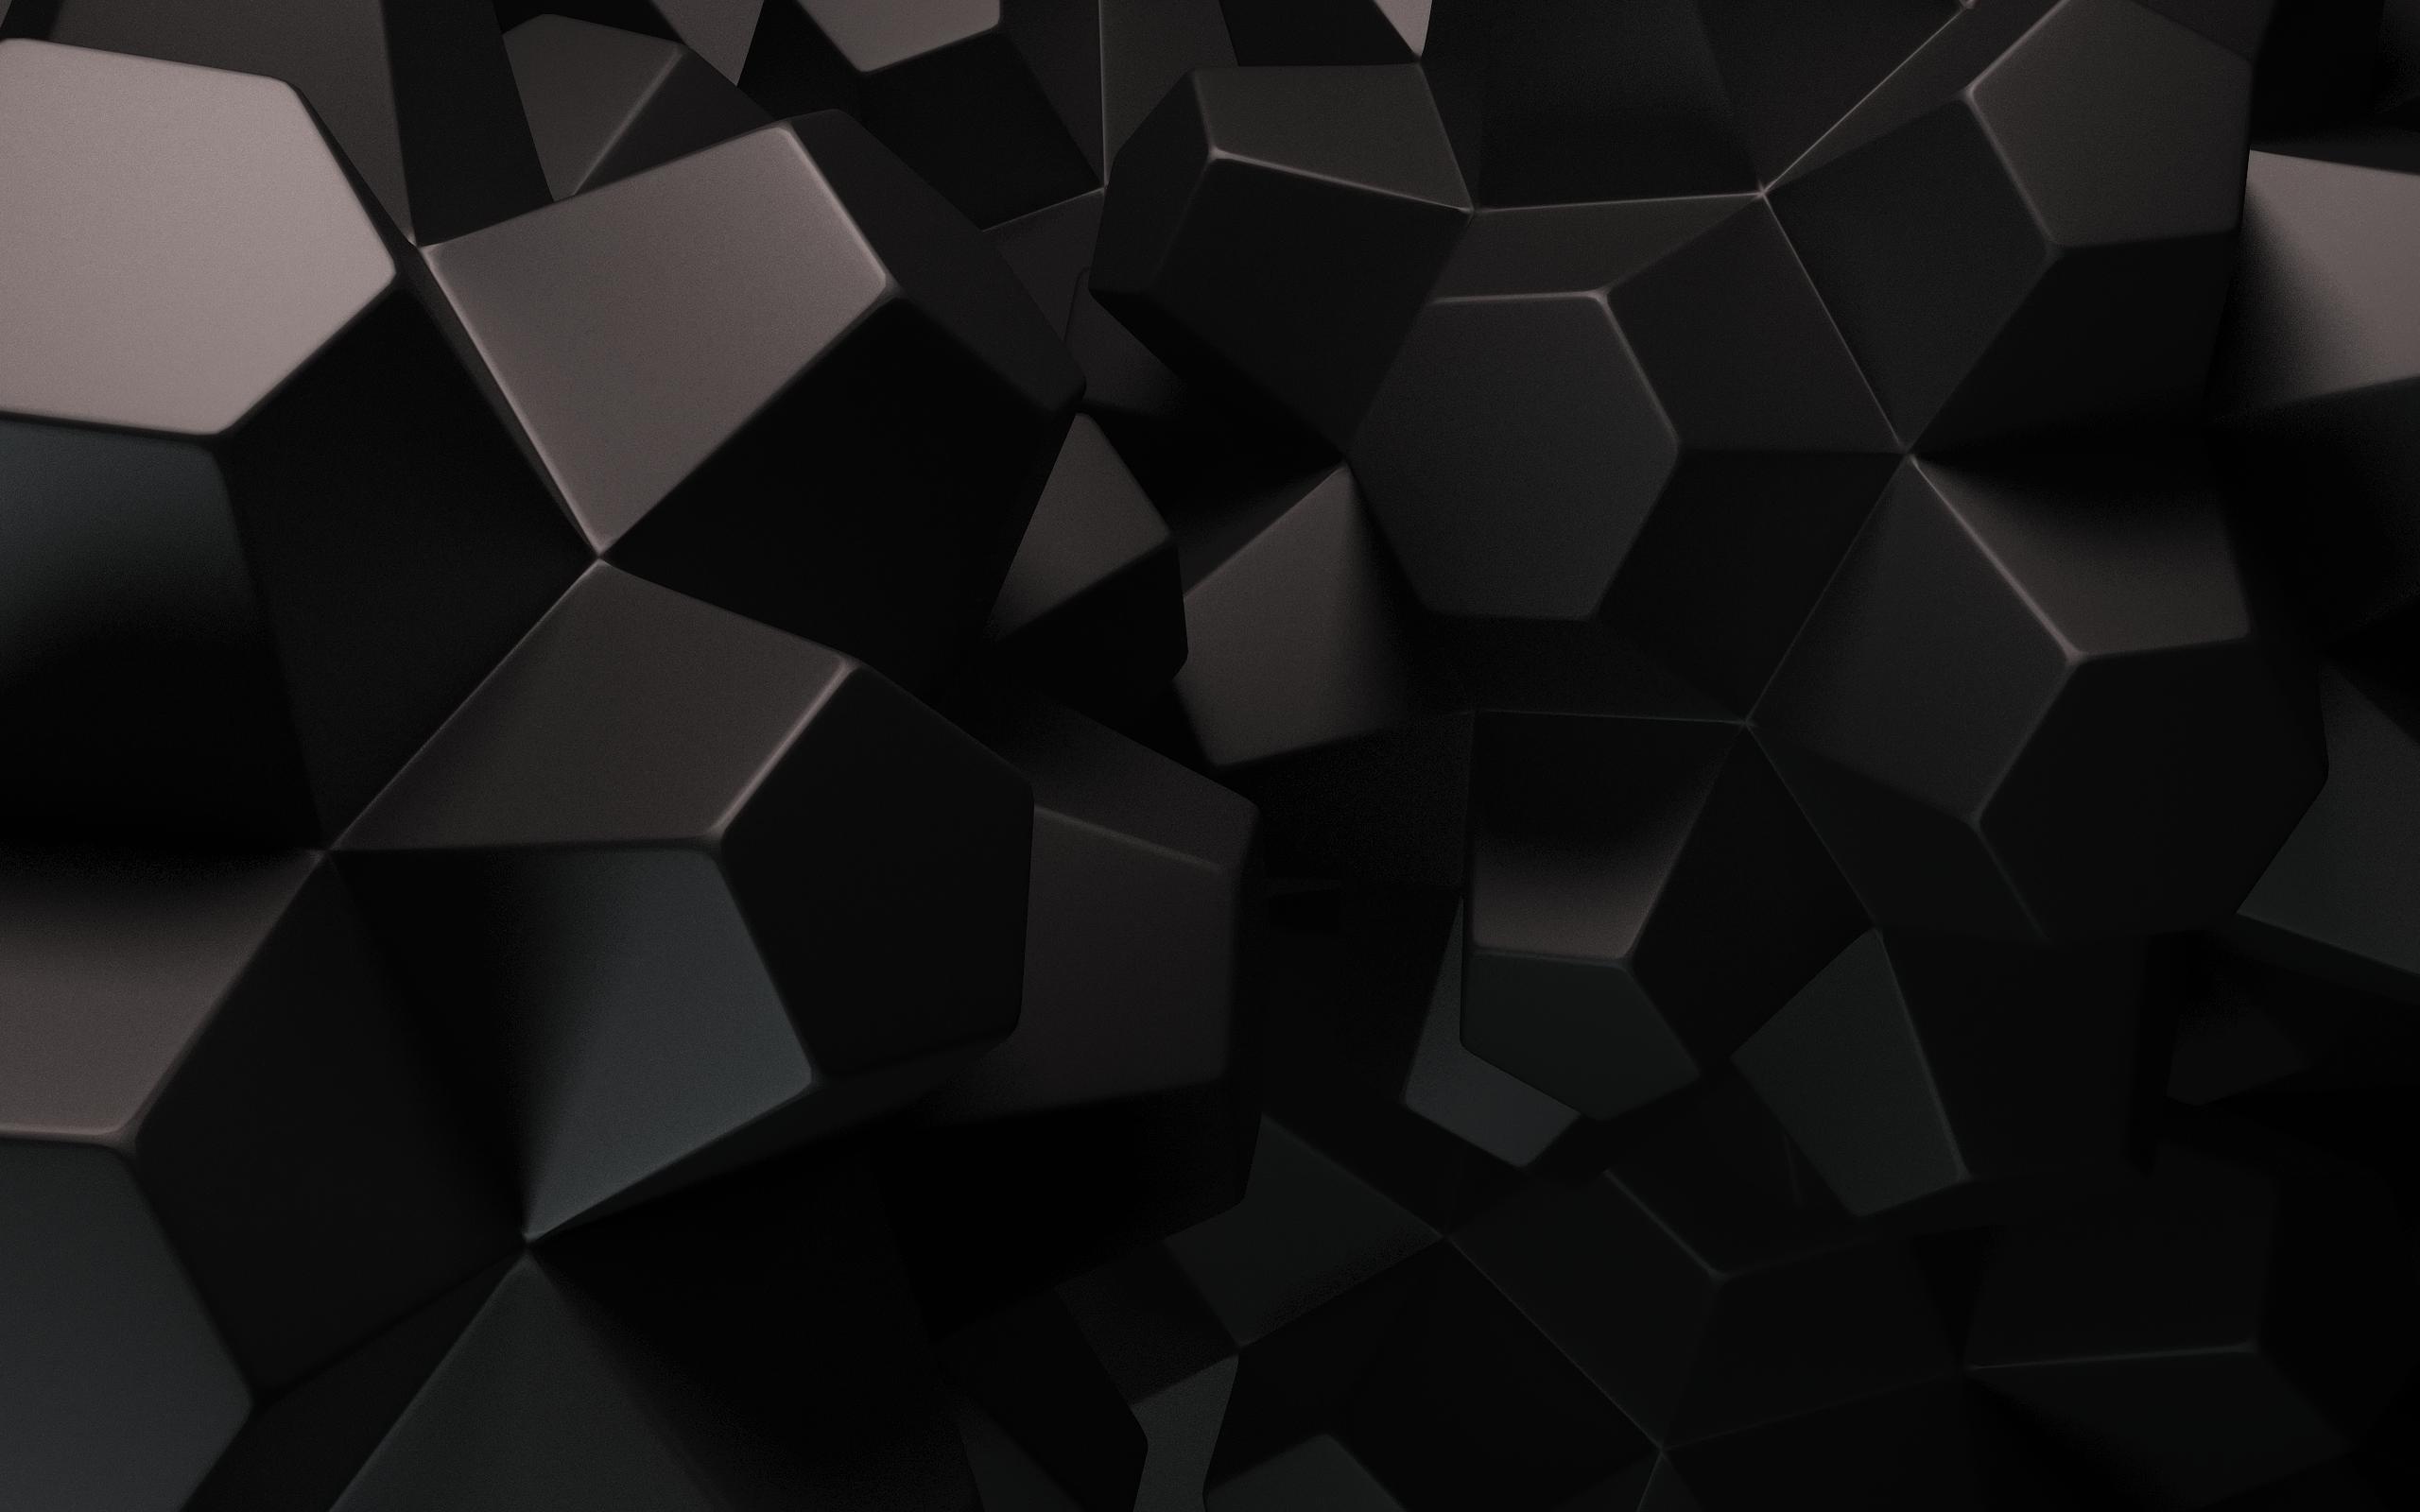 Geometric shapes Wallpaper Geometric shapes wallpaper